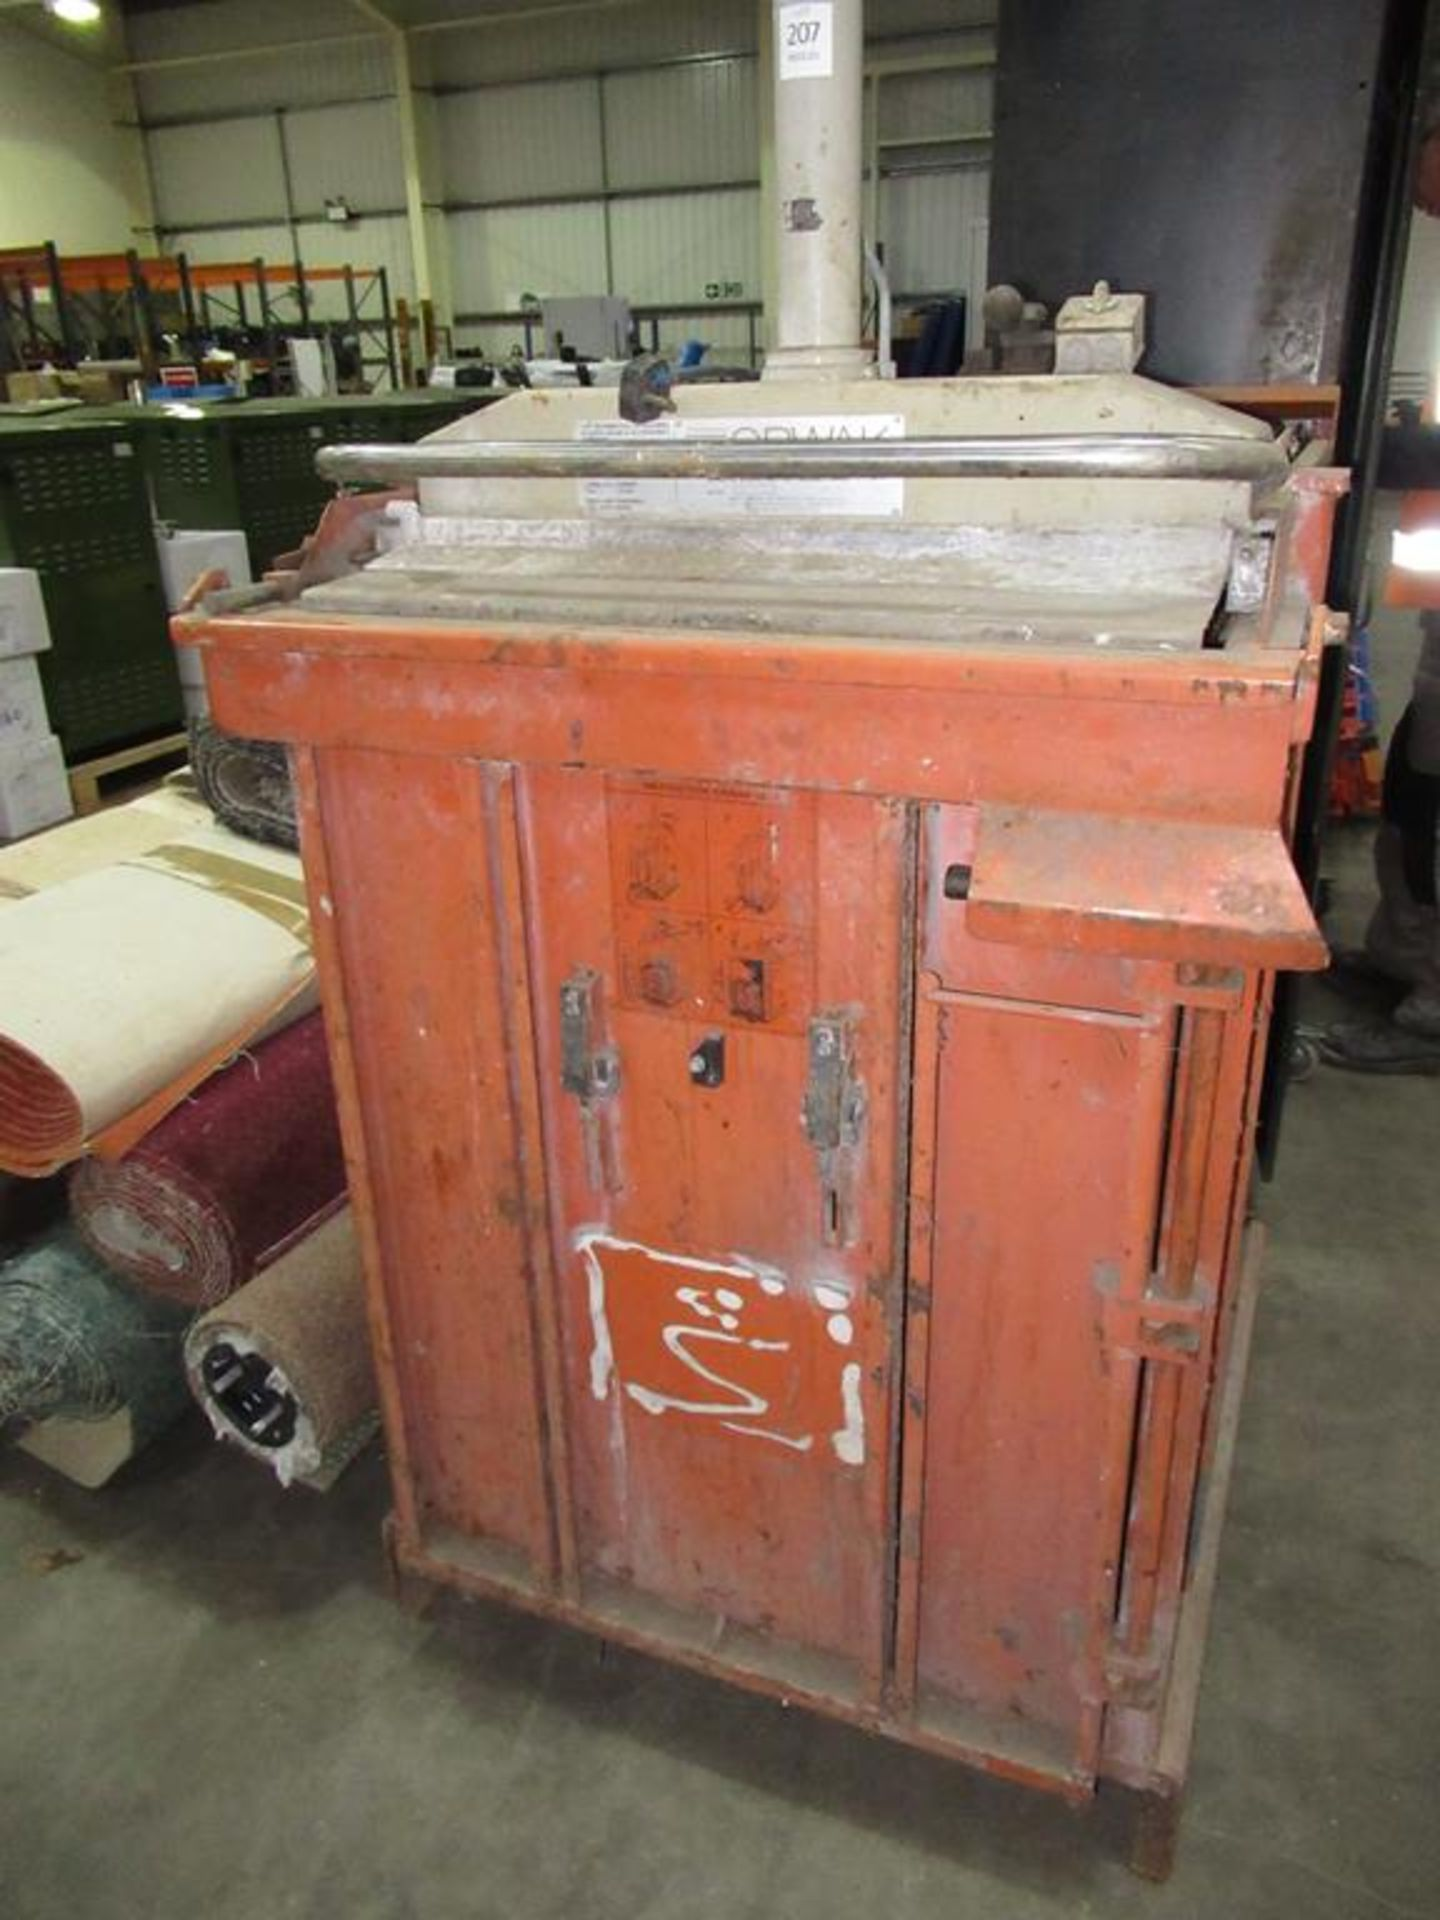 Lot 207 - An Orwak Waste Compactor